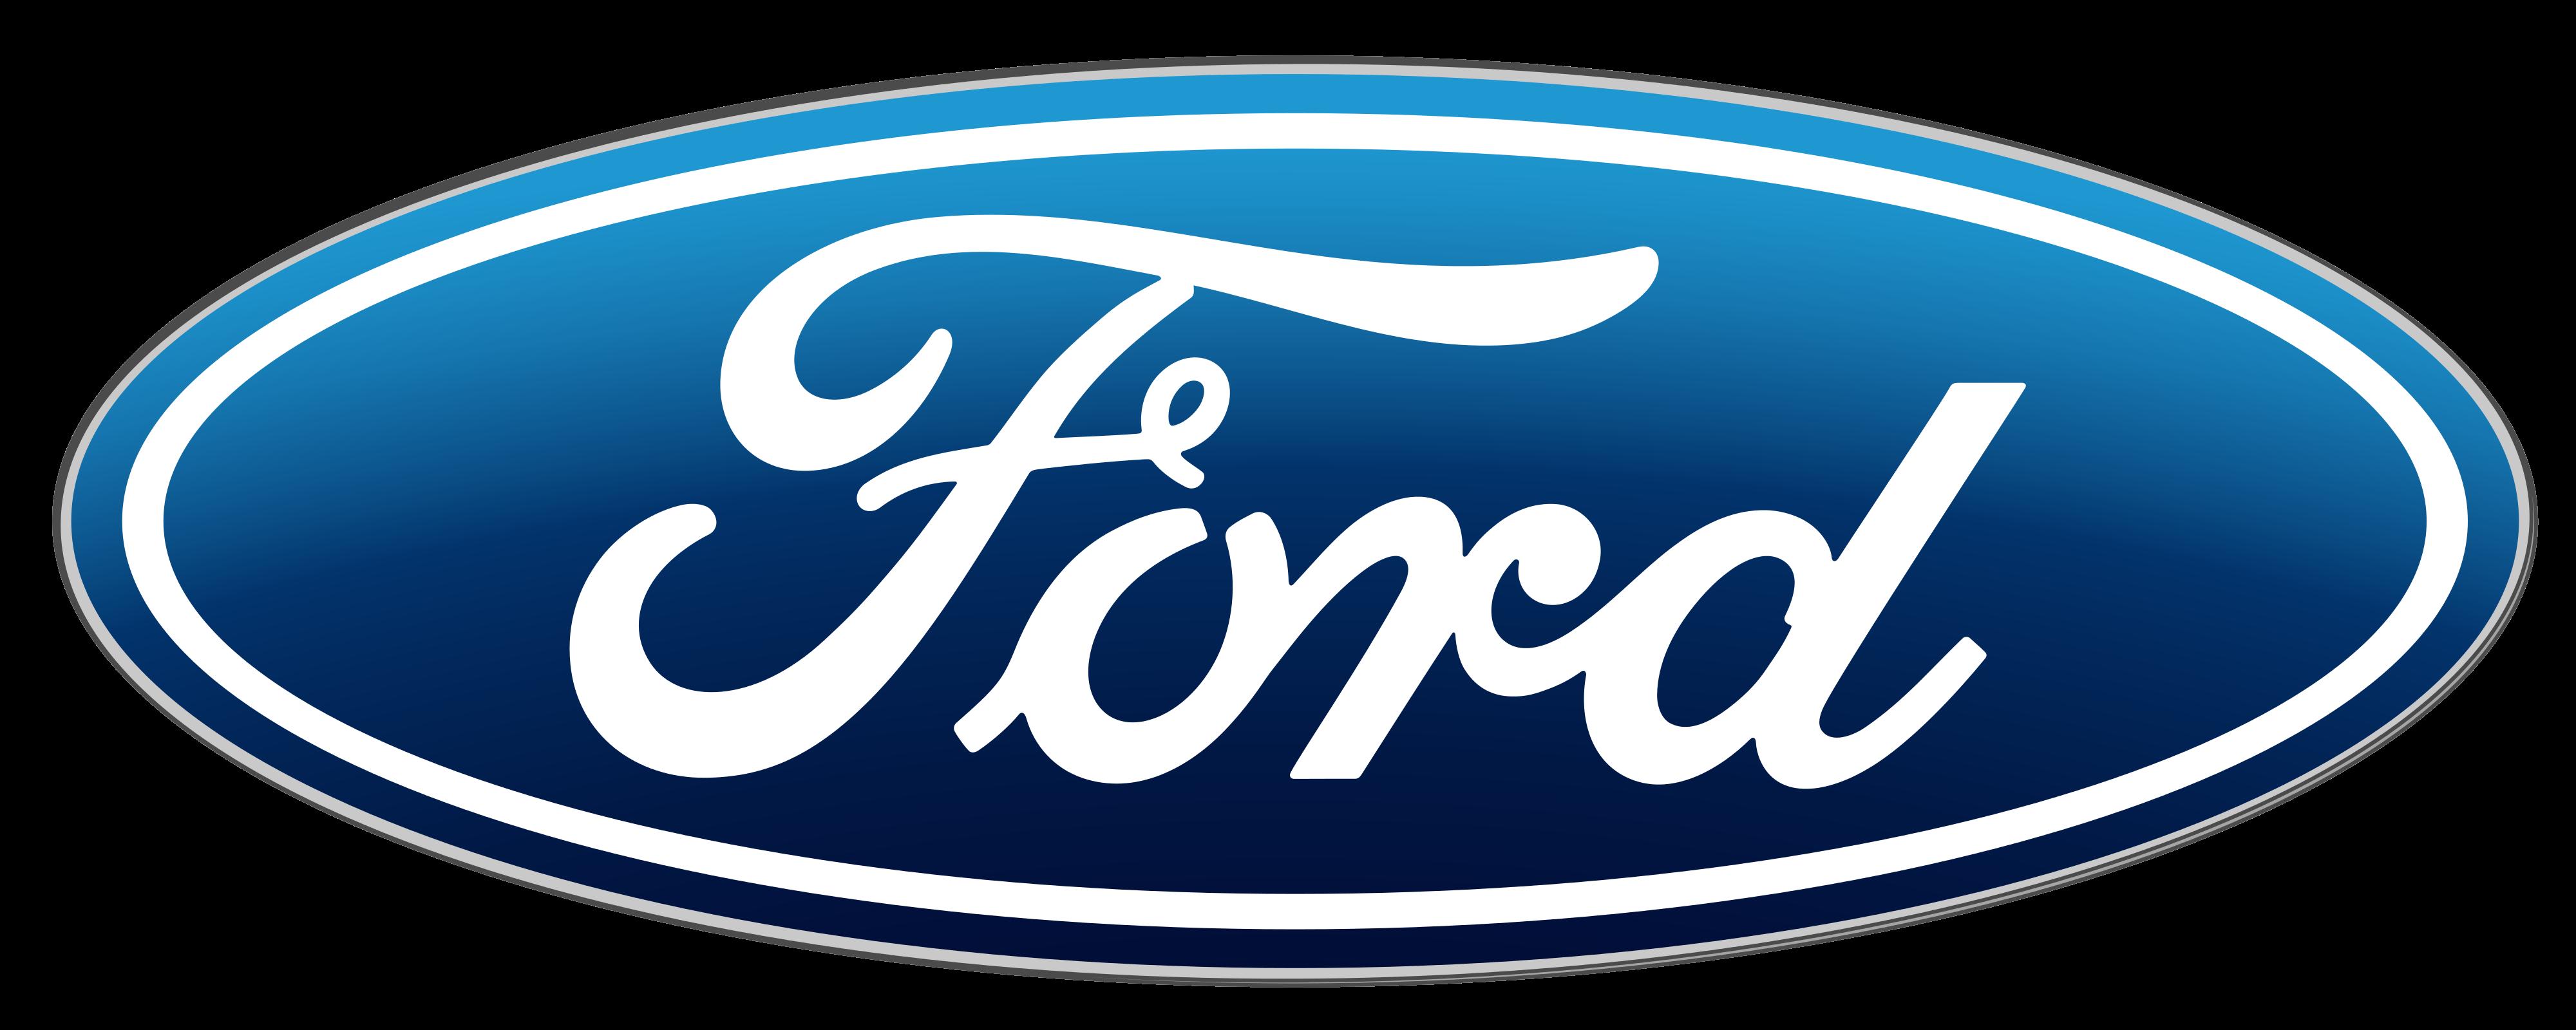 ford logo 2 - Ford Logo